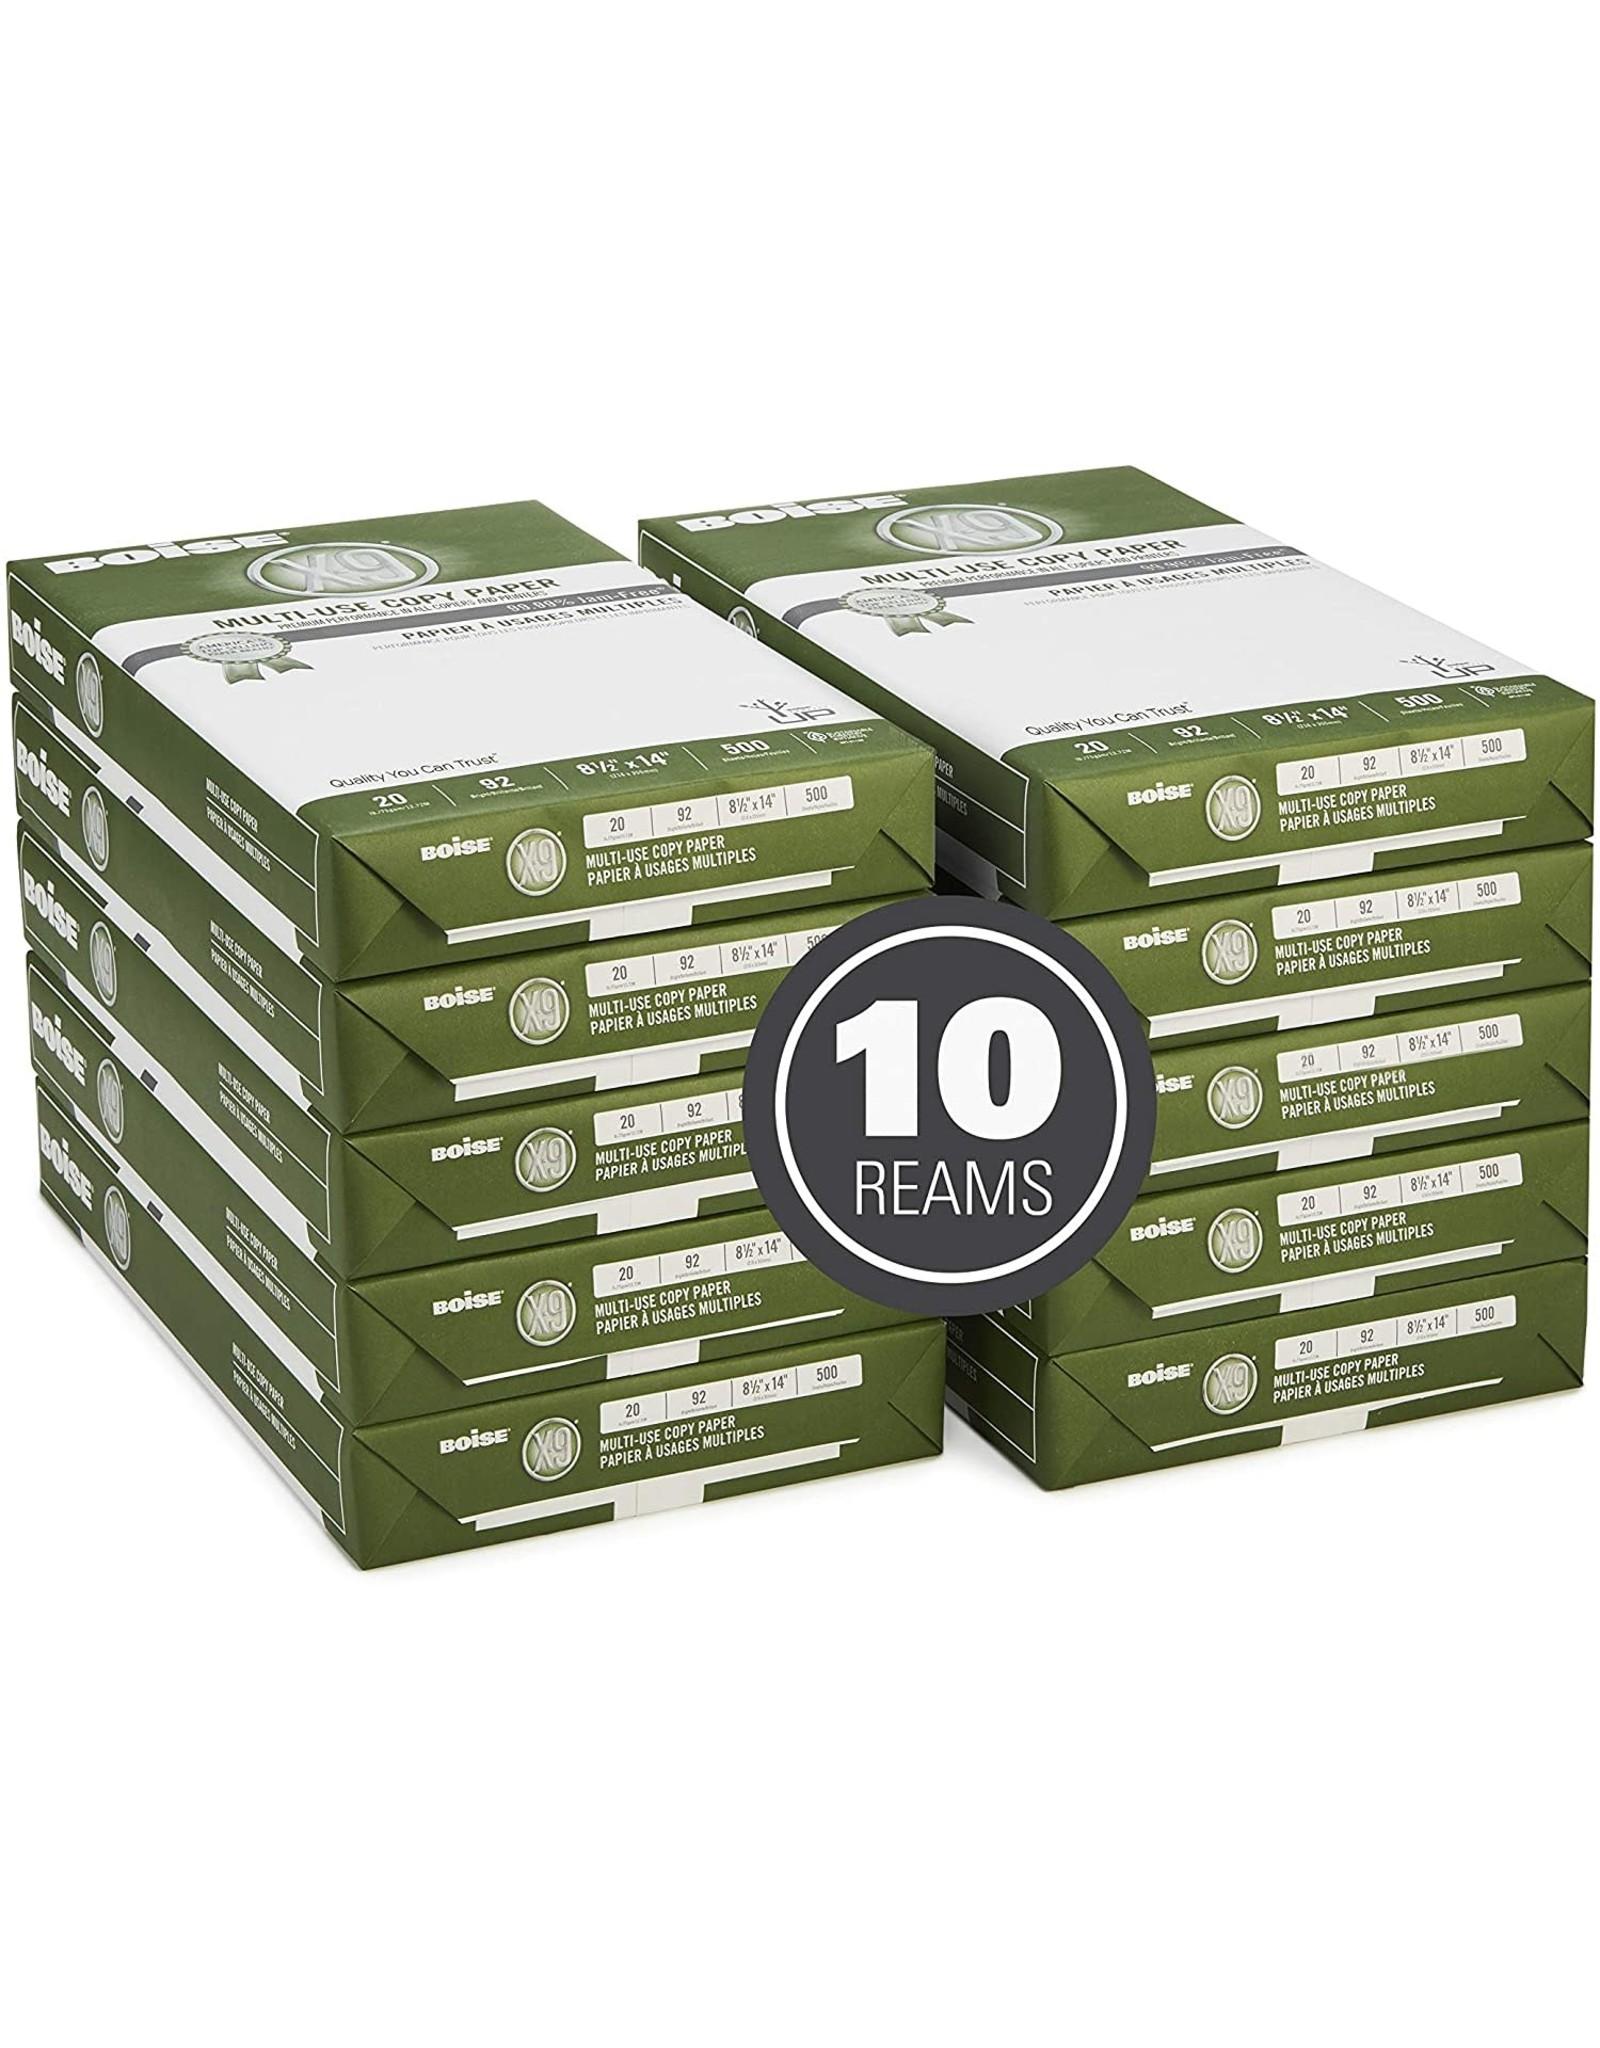 "Boise Paper Boise Paper X-9 Multi-Use Copy Paper, 8.5"" x 14"" Legal, 92 Bright White, 20 lb, 10 Ream Carton (5,000 Sheets)"